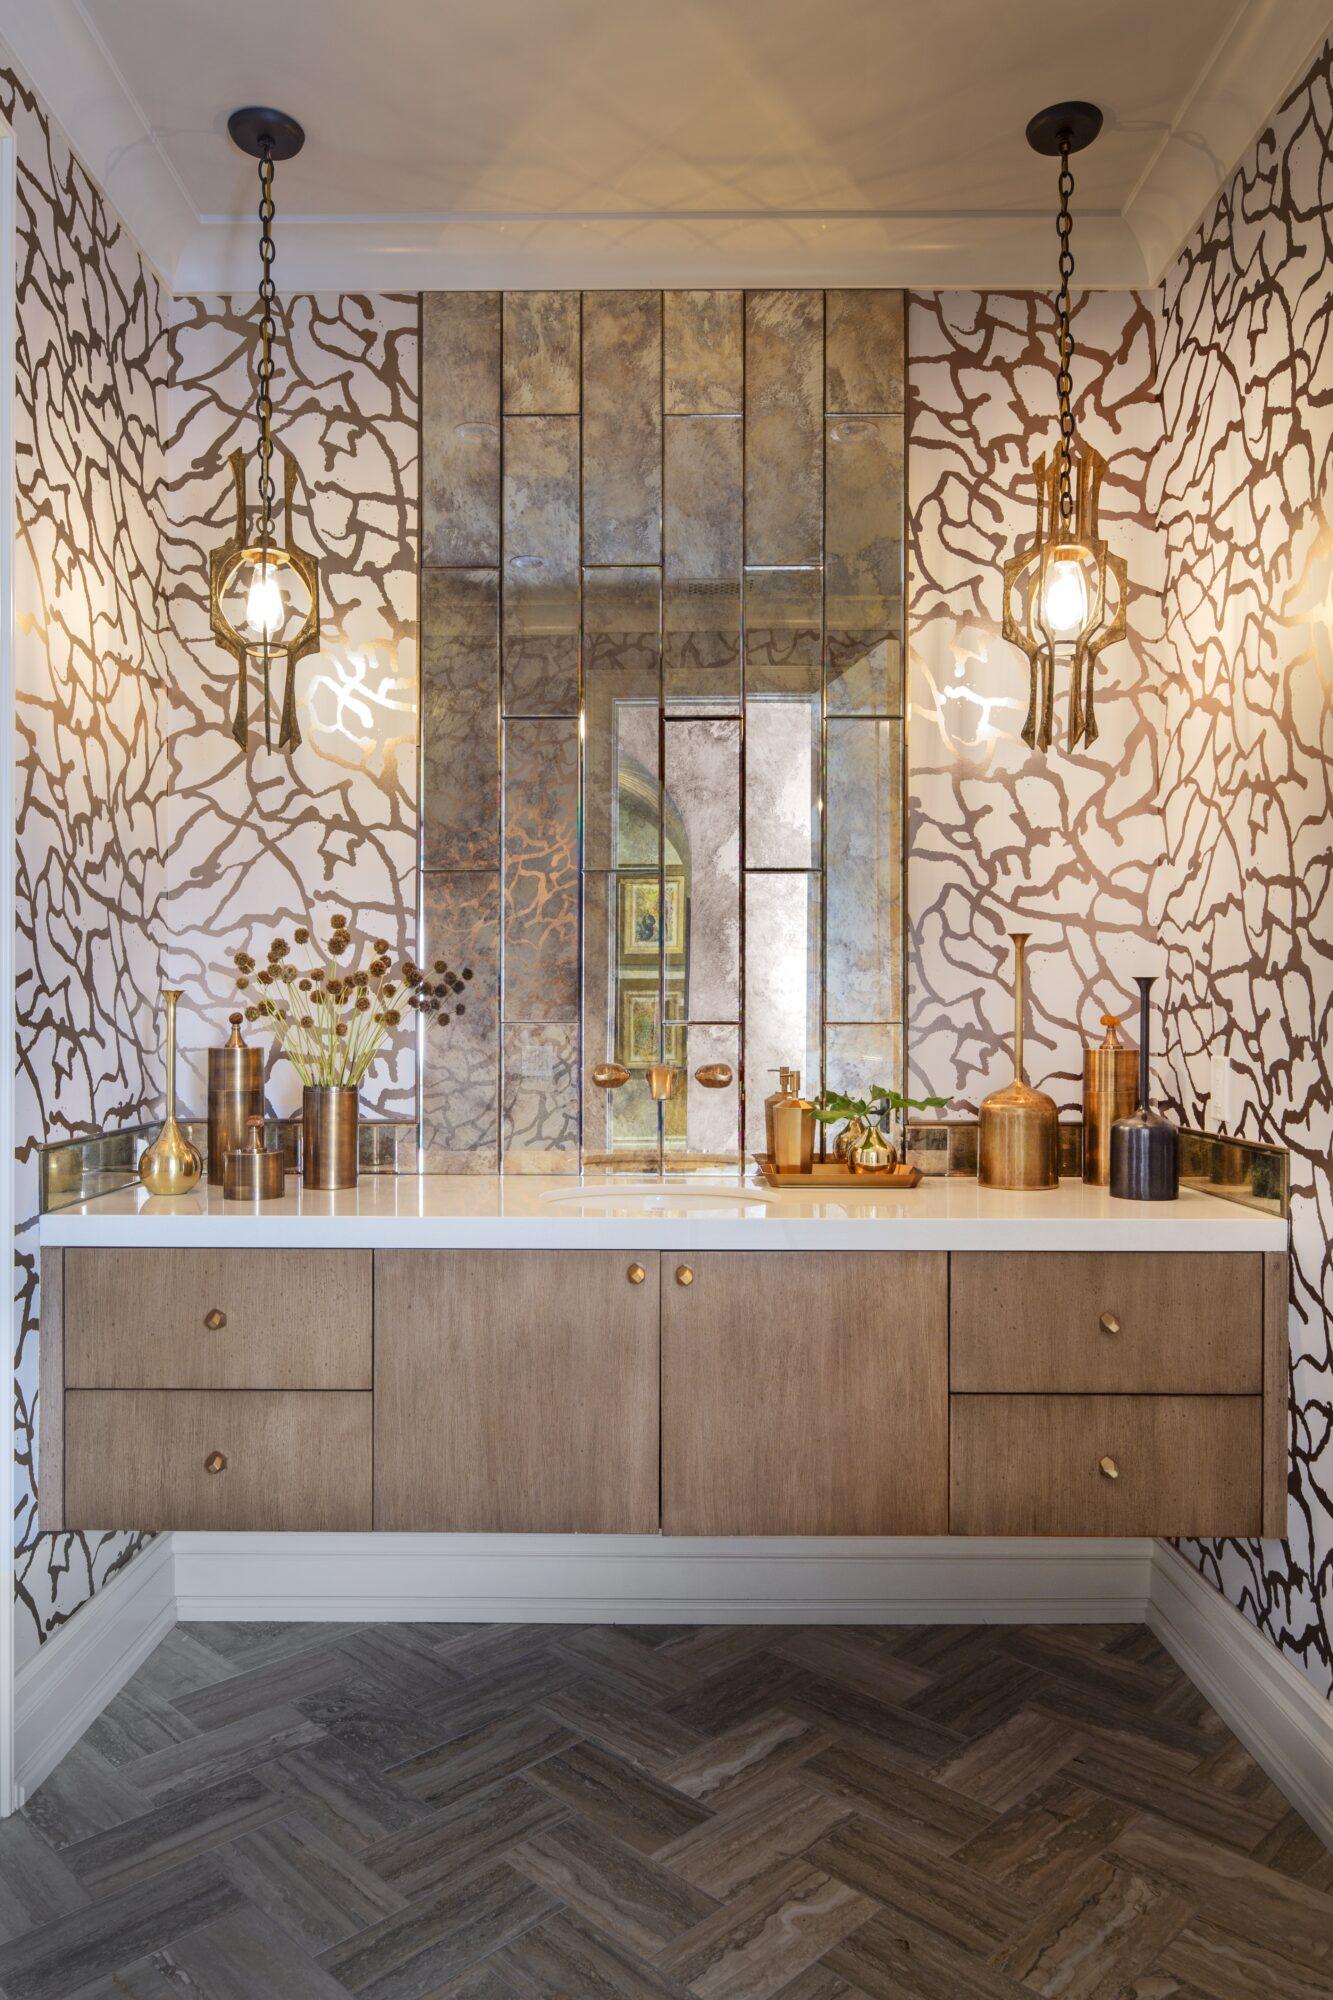 JeffAndrews Astek wallpaper powder room